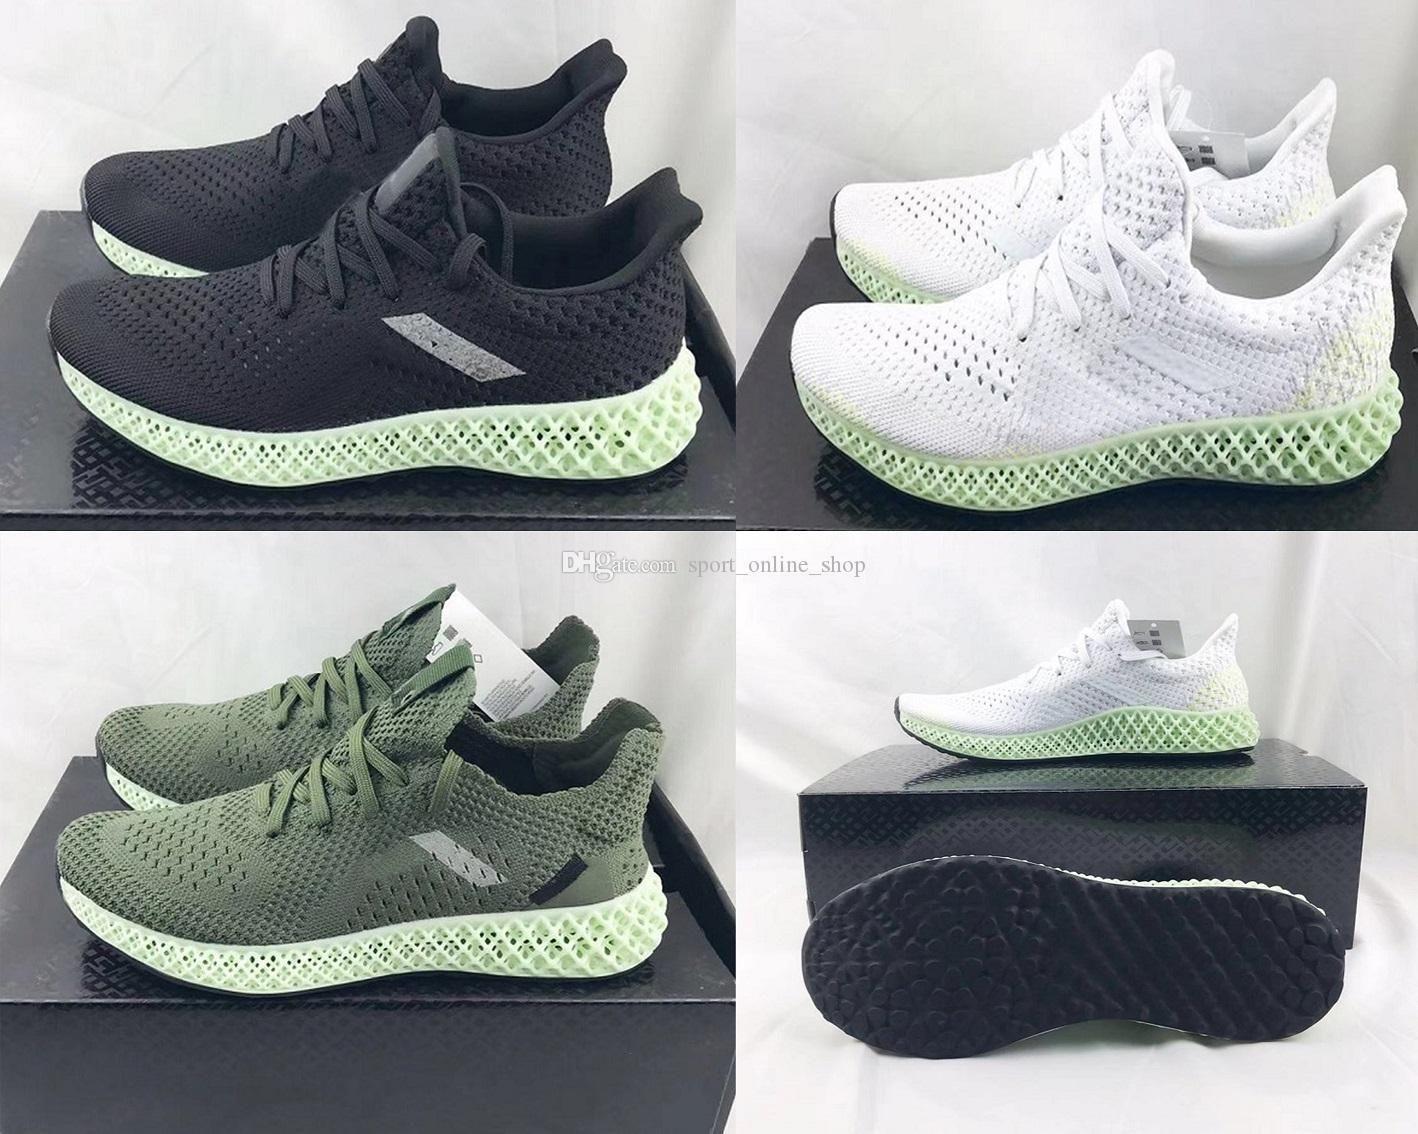 2019 futurecraft alfaedge 4d asw y-3 corredor y3 running shoes mens ao ar livre sapato esportivo tamanho39 ~ 46wit box